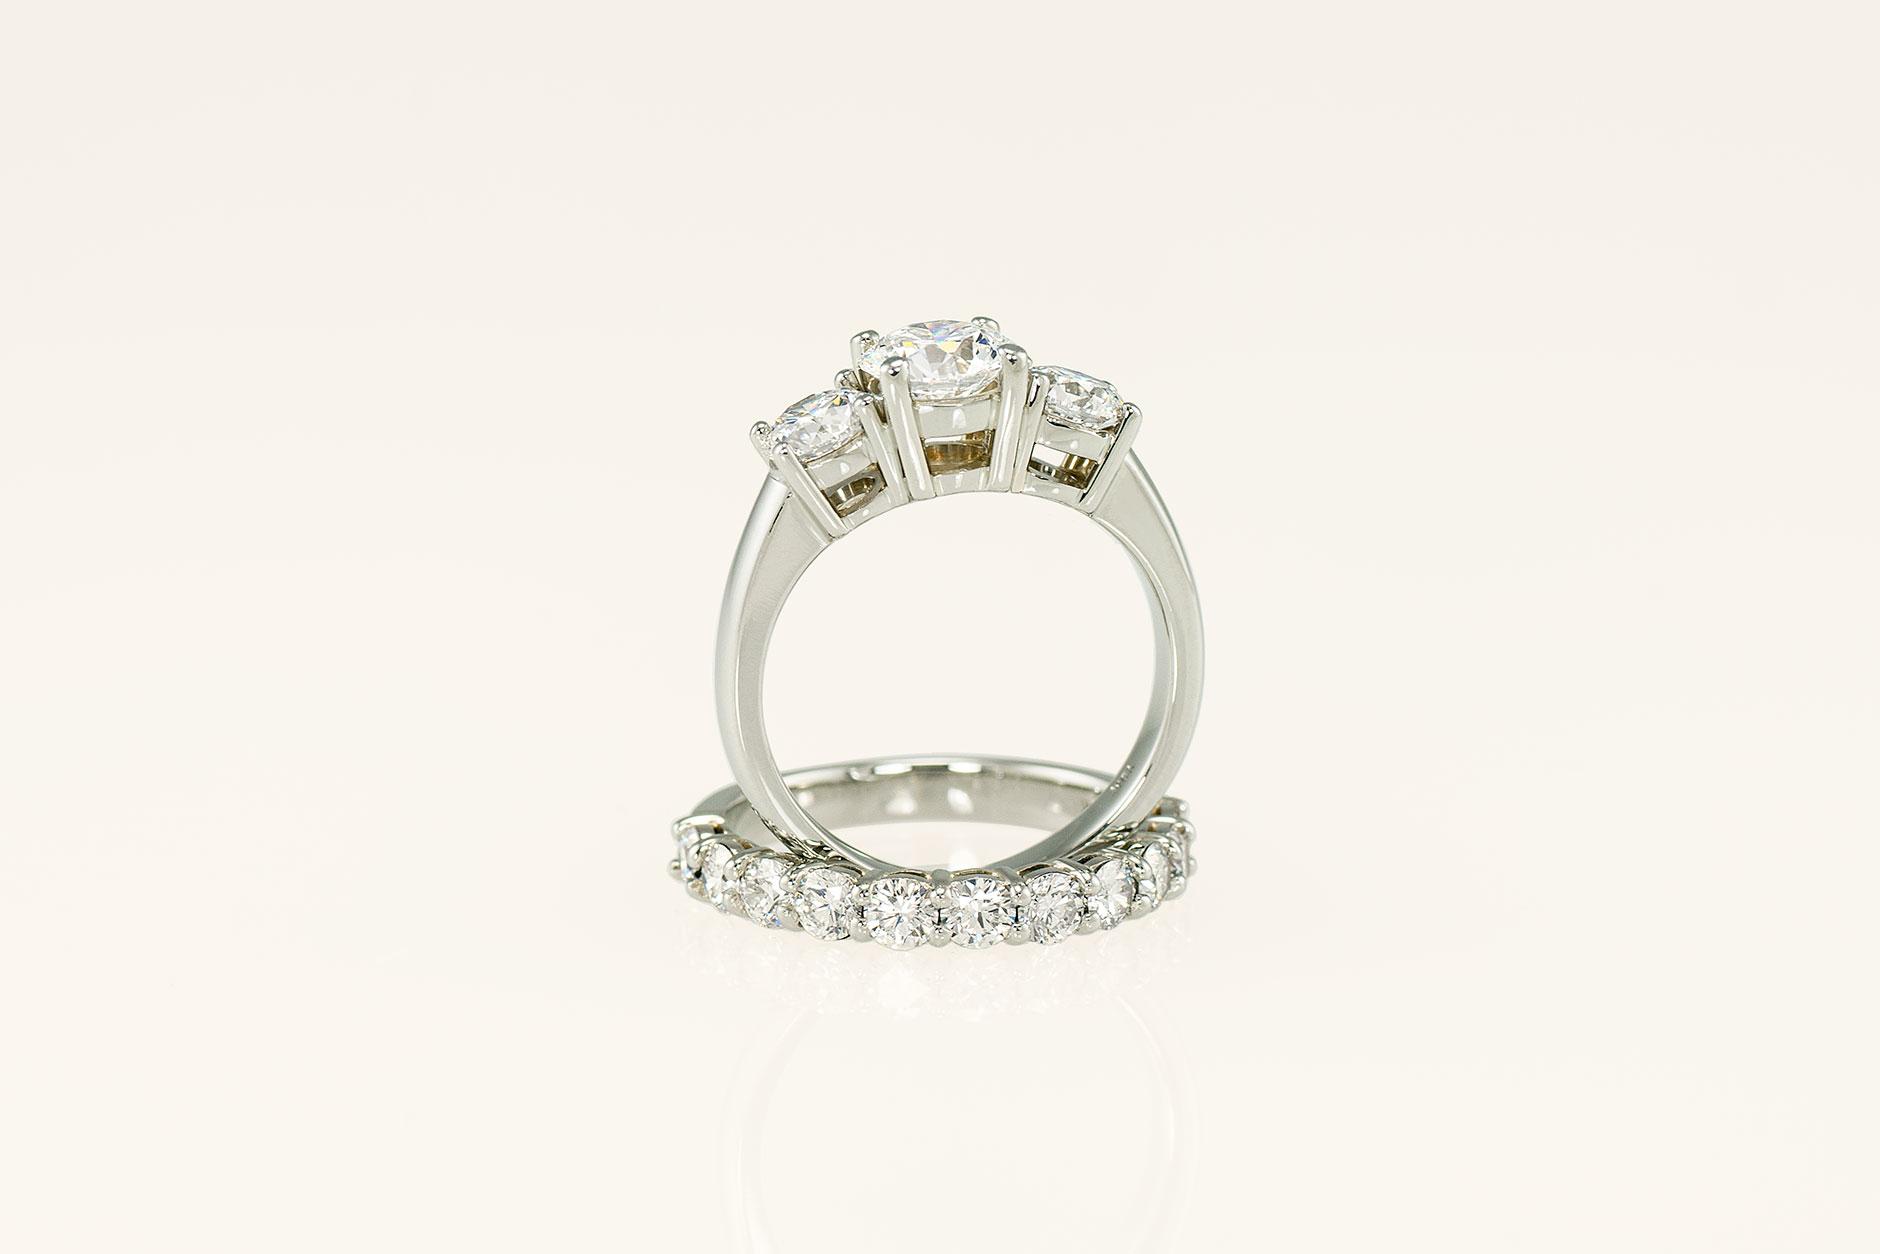 19k White Gold Basket Set 3 Stone Engagement Ring + Matching Diamond Wedding Band - NEWA Goldsmith